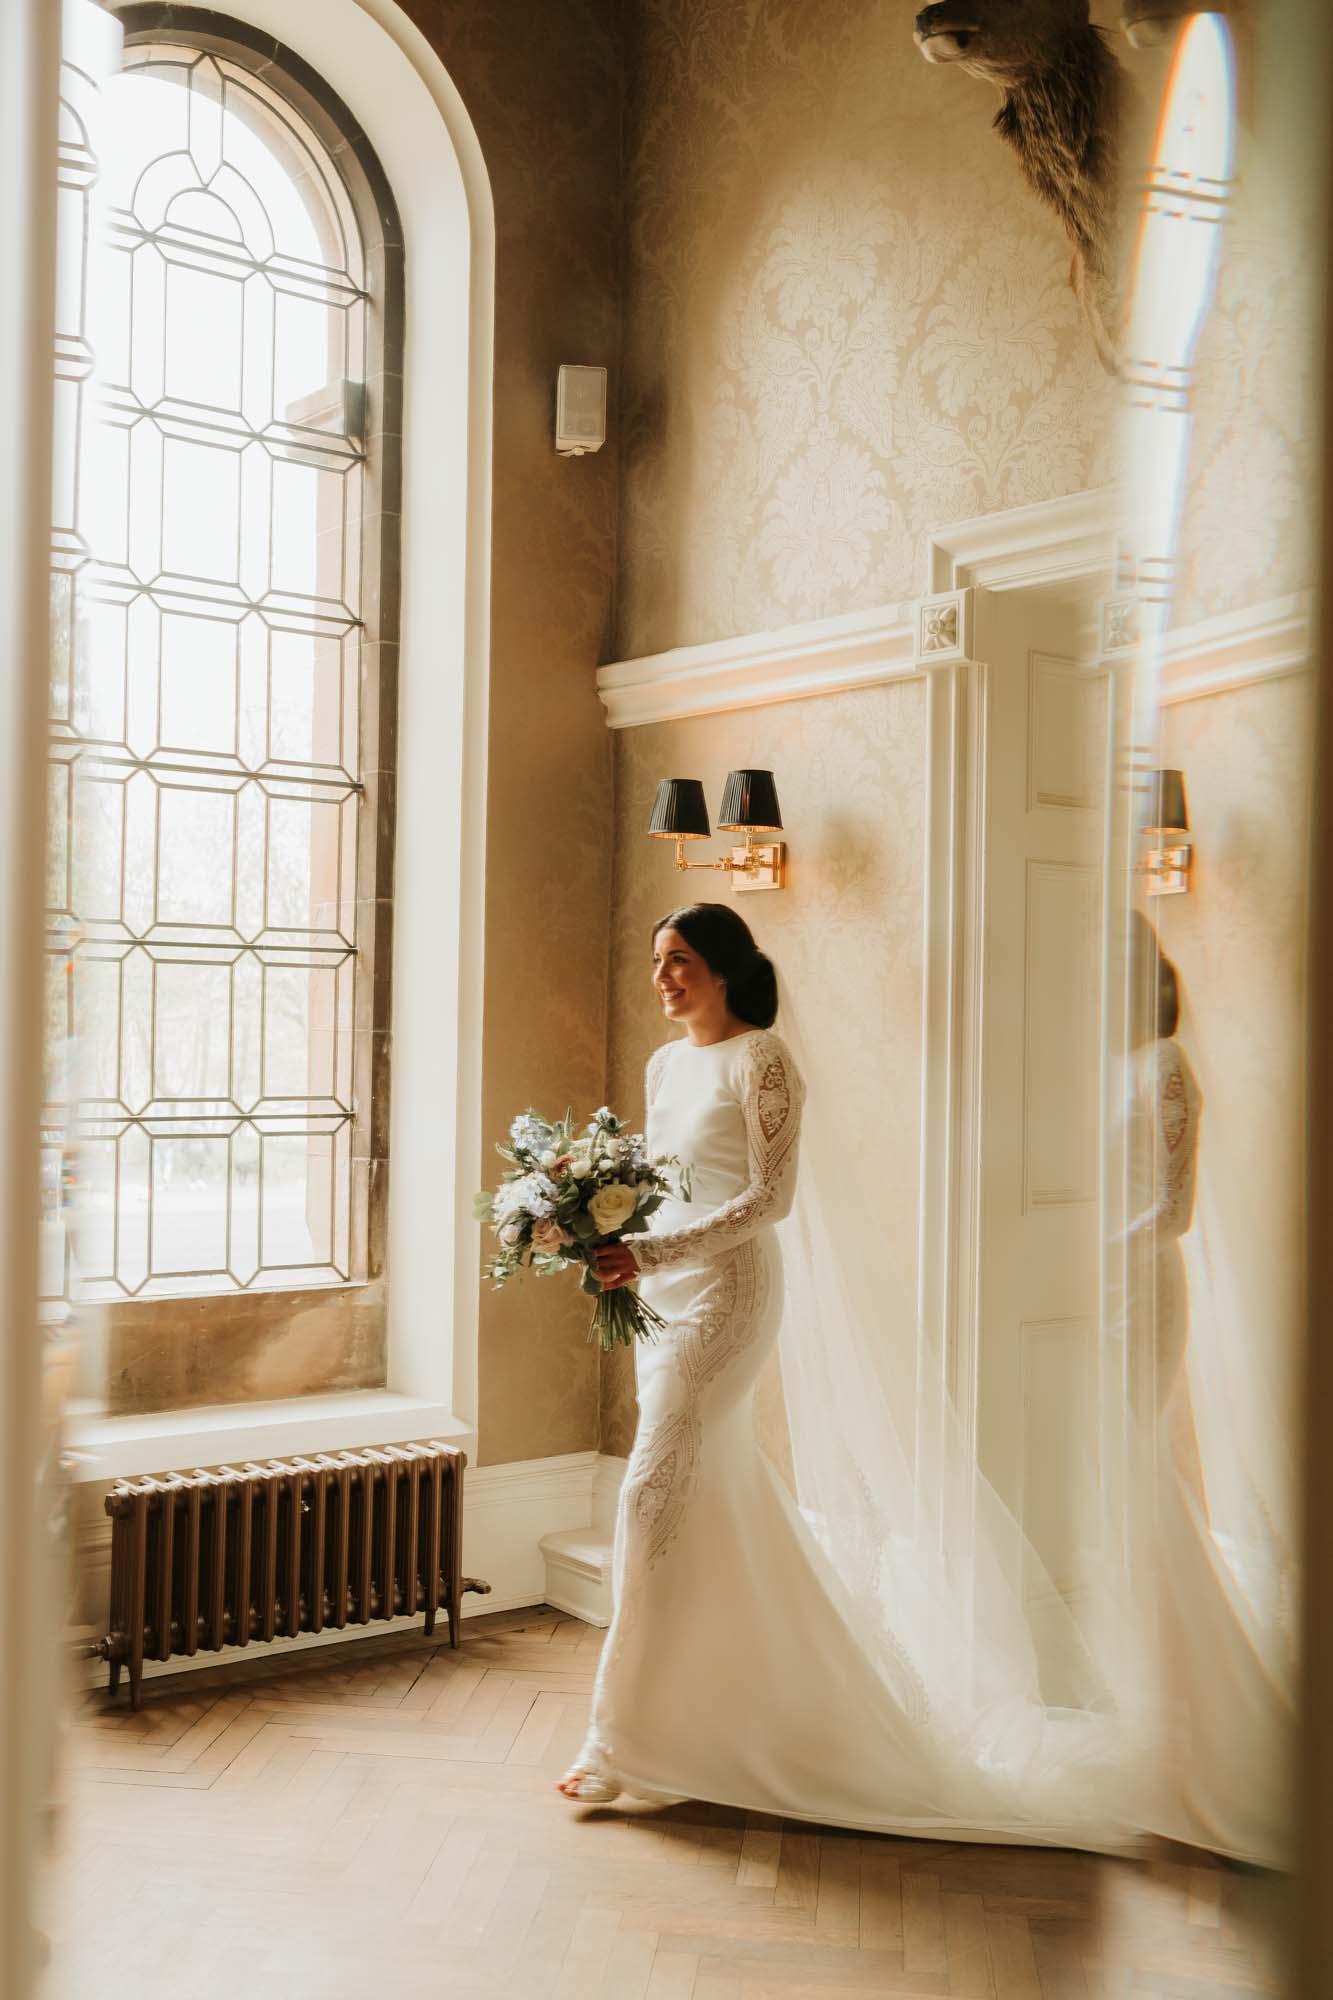 Cornhill Castle Wedding Blog -26